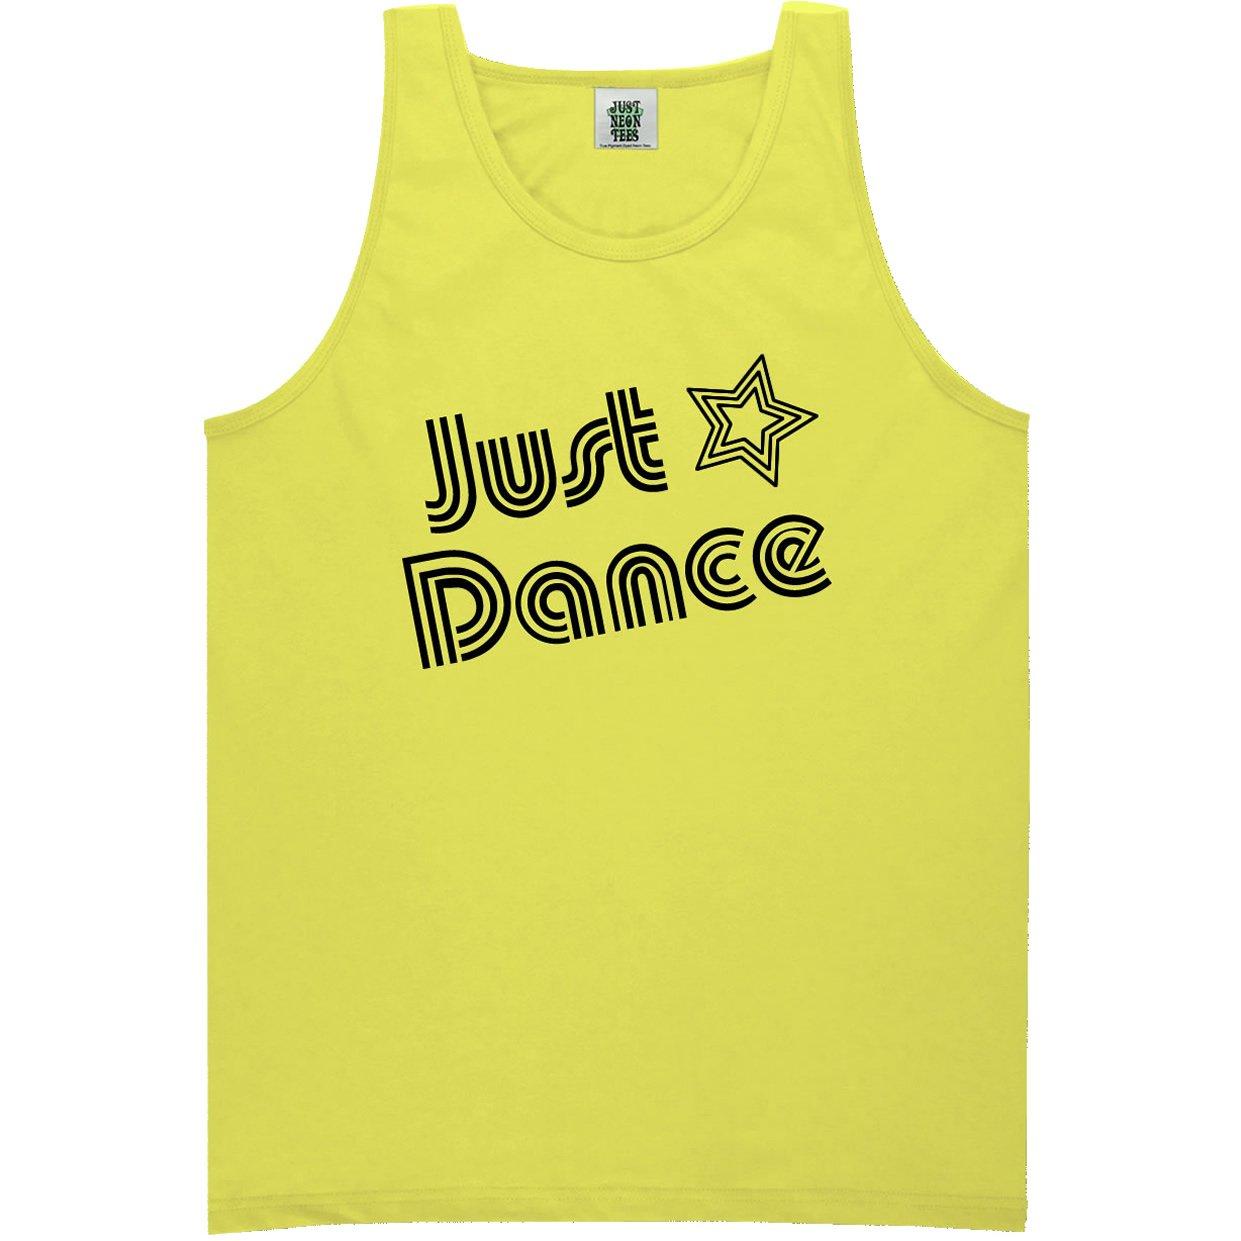 ZeroGravitee Youth Just Dance Bright Neon Yellow Tank Top X-Small